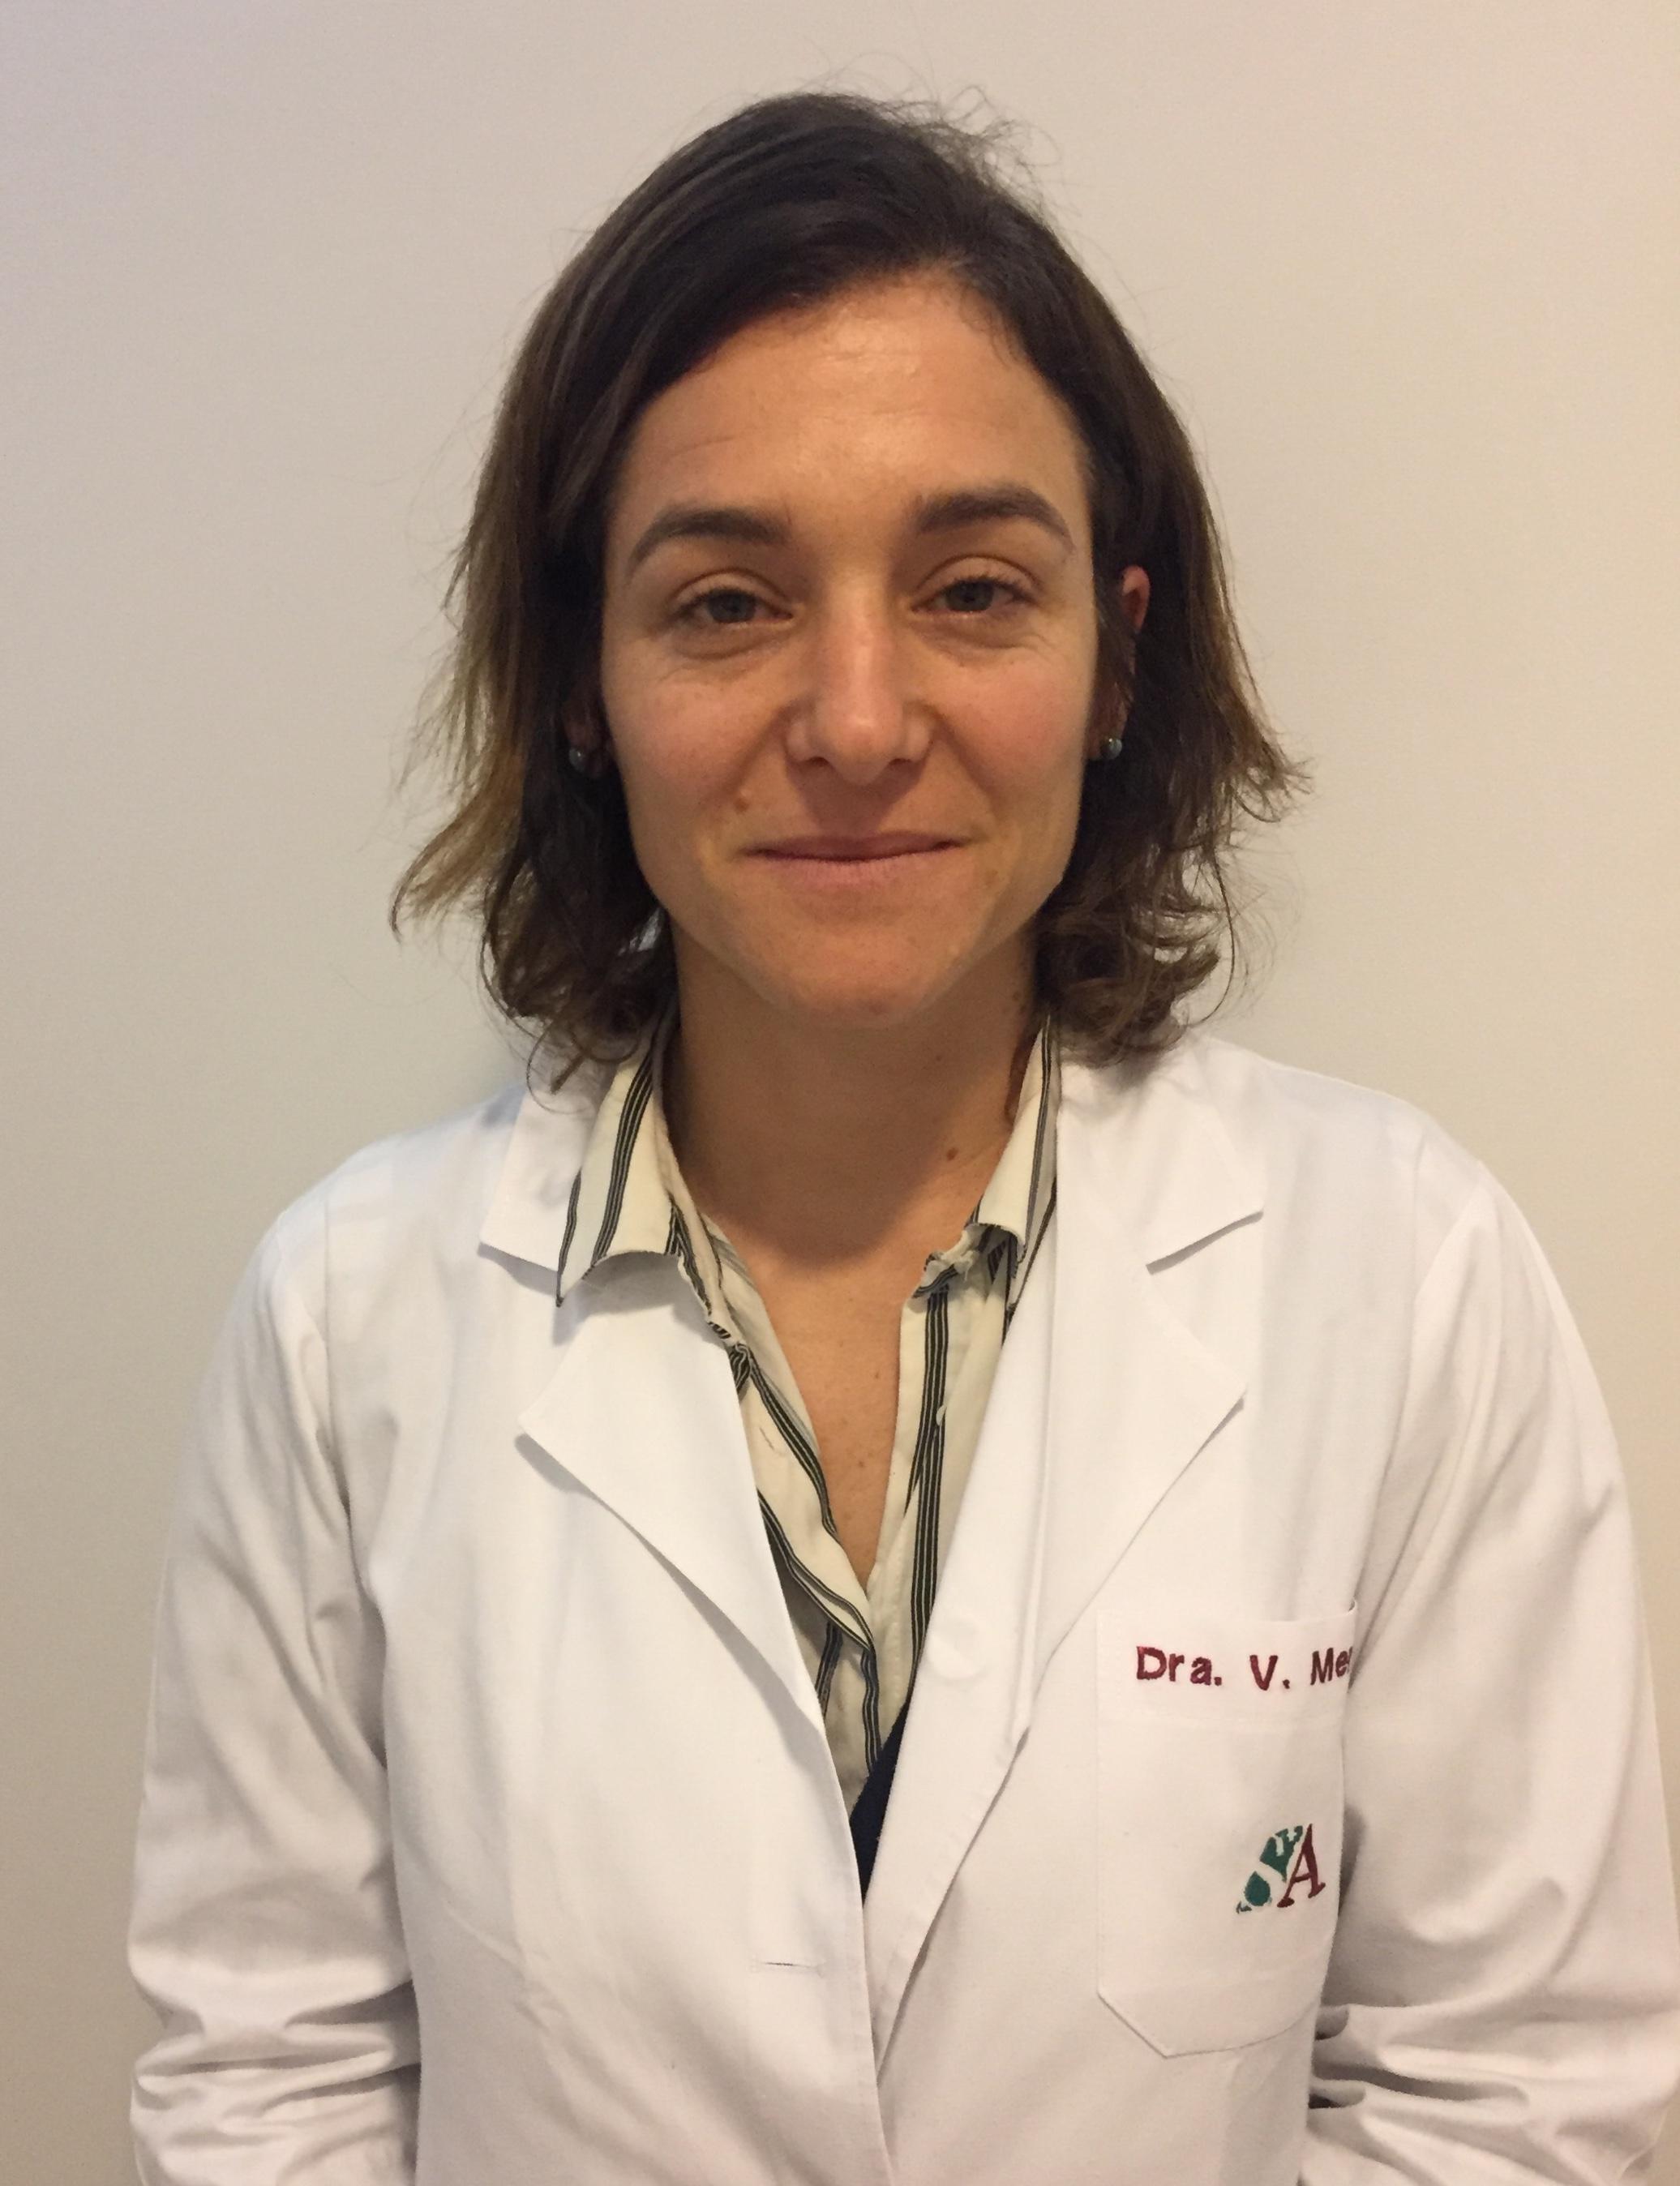 Dra. Merola Valentina